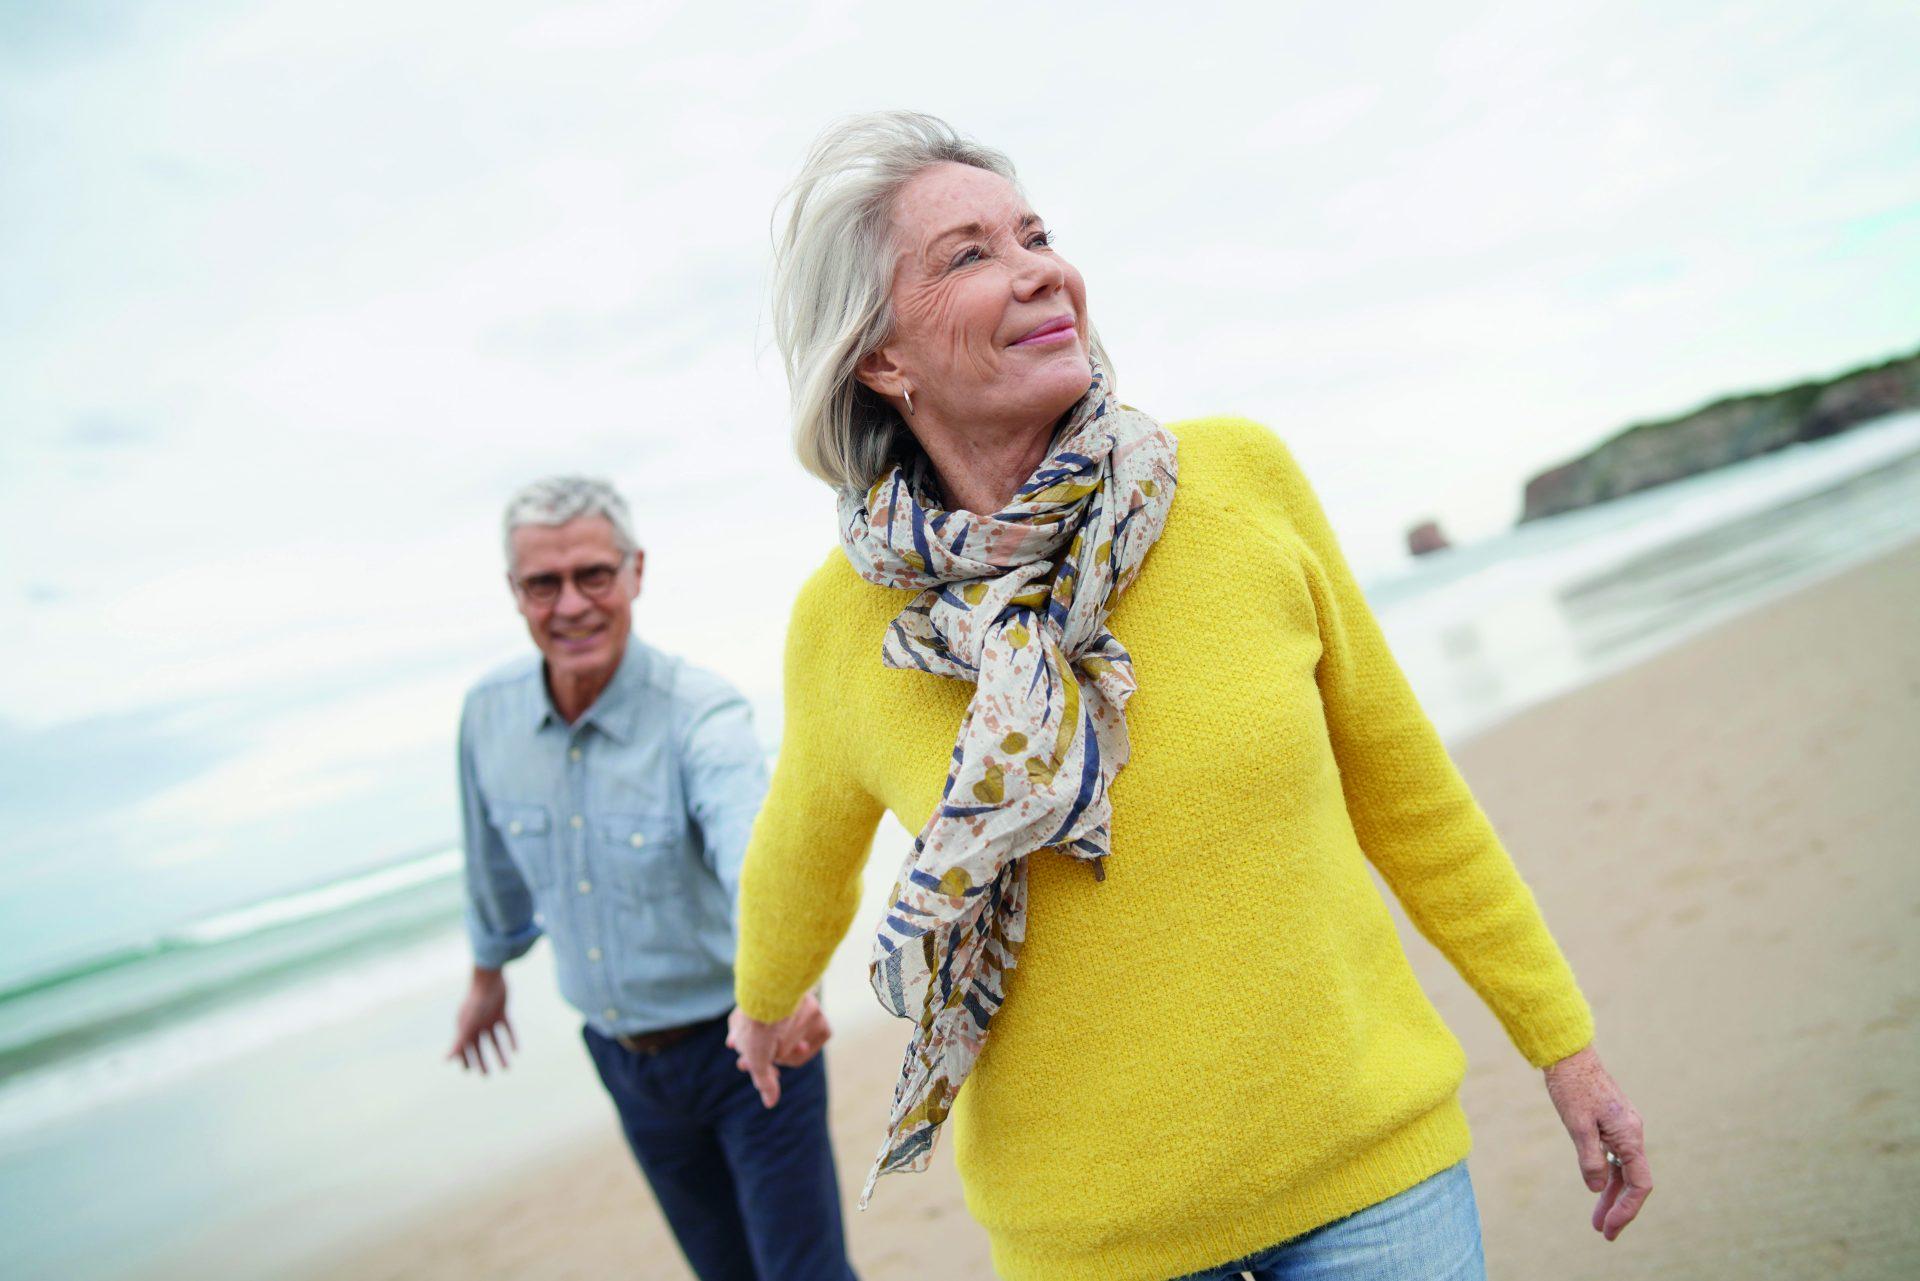 pension contributions, tax savings, building wealth, pension scheme